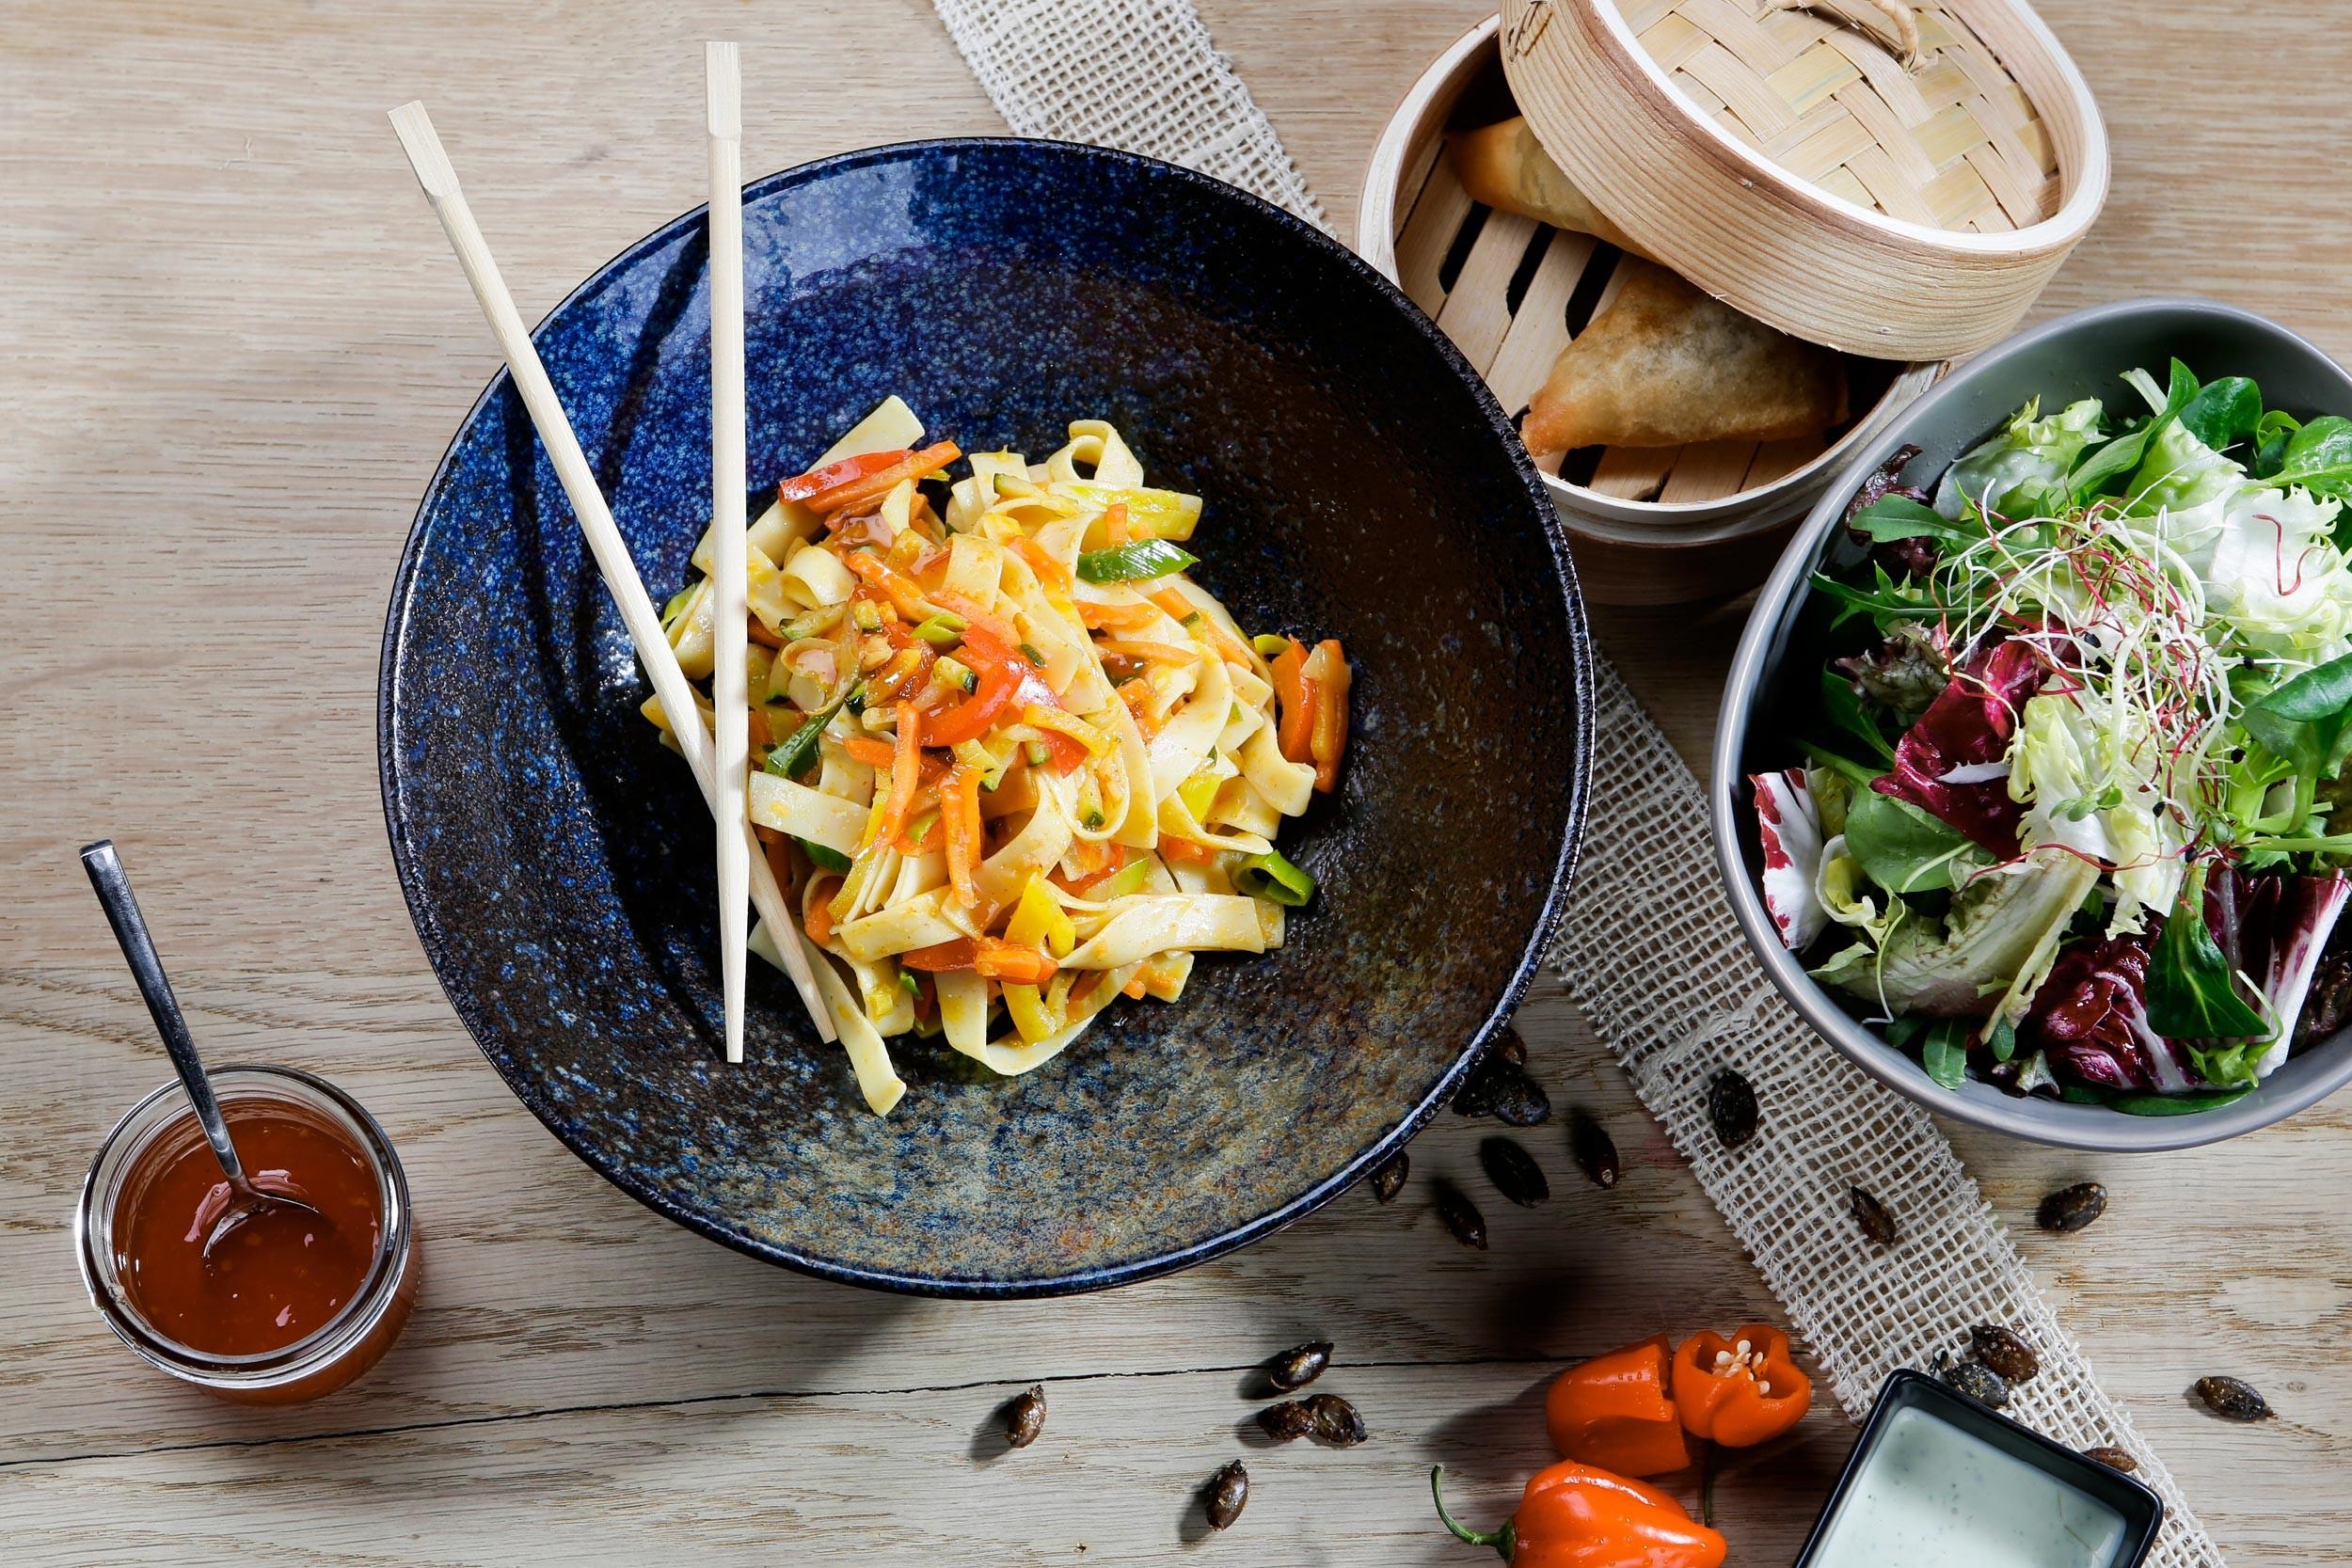 Mutzner, Catering, Gastronomie, Restaurant